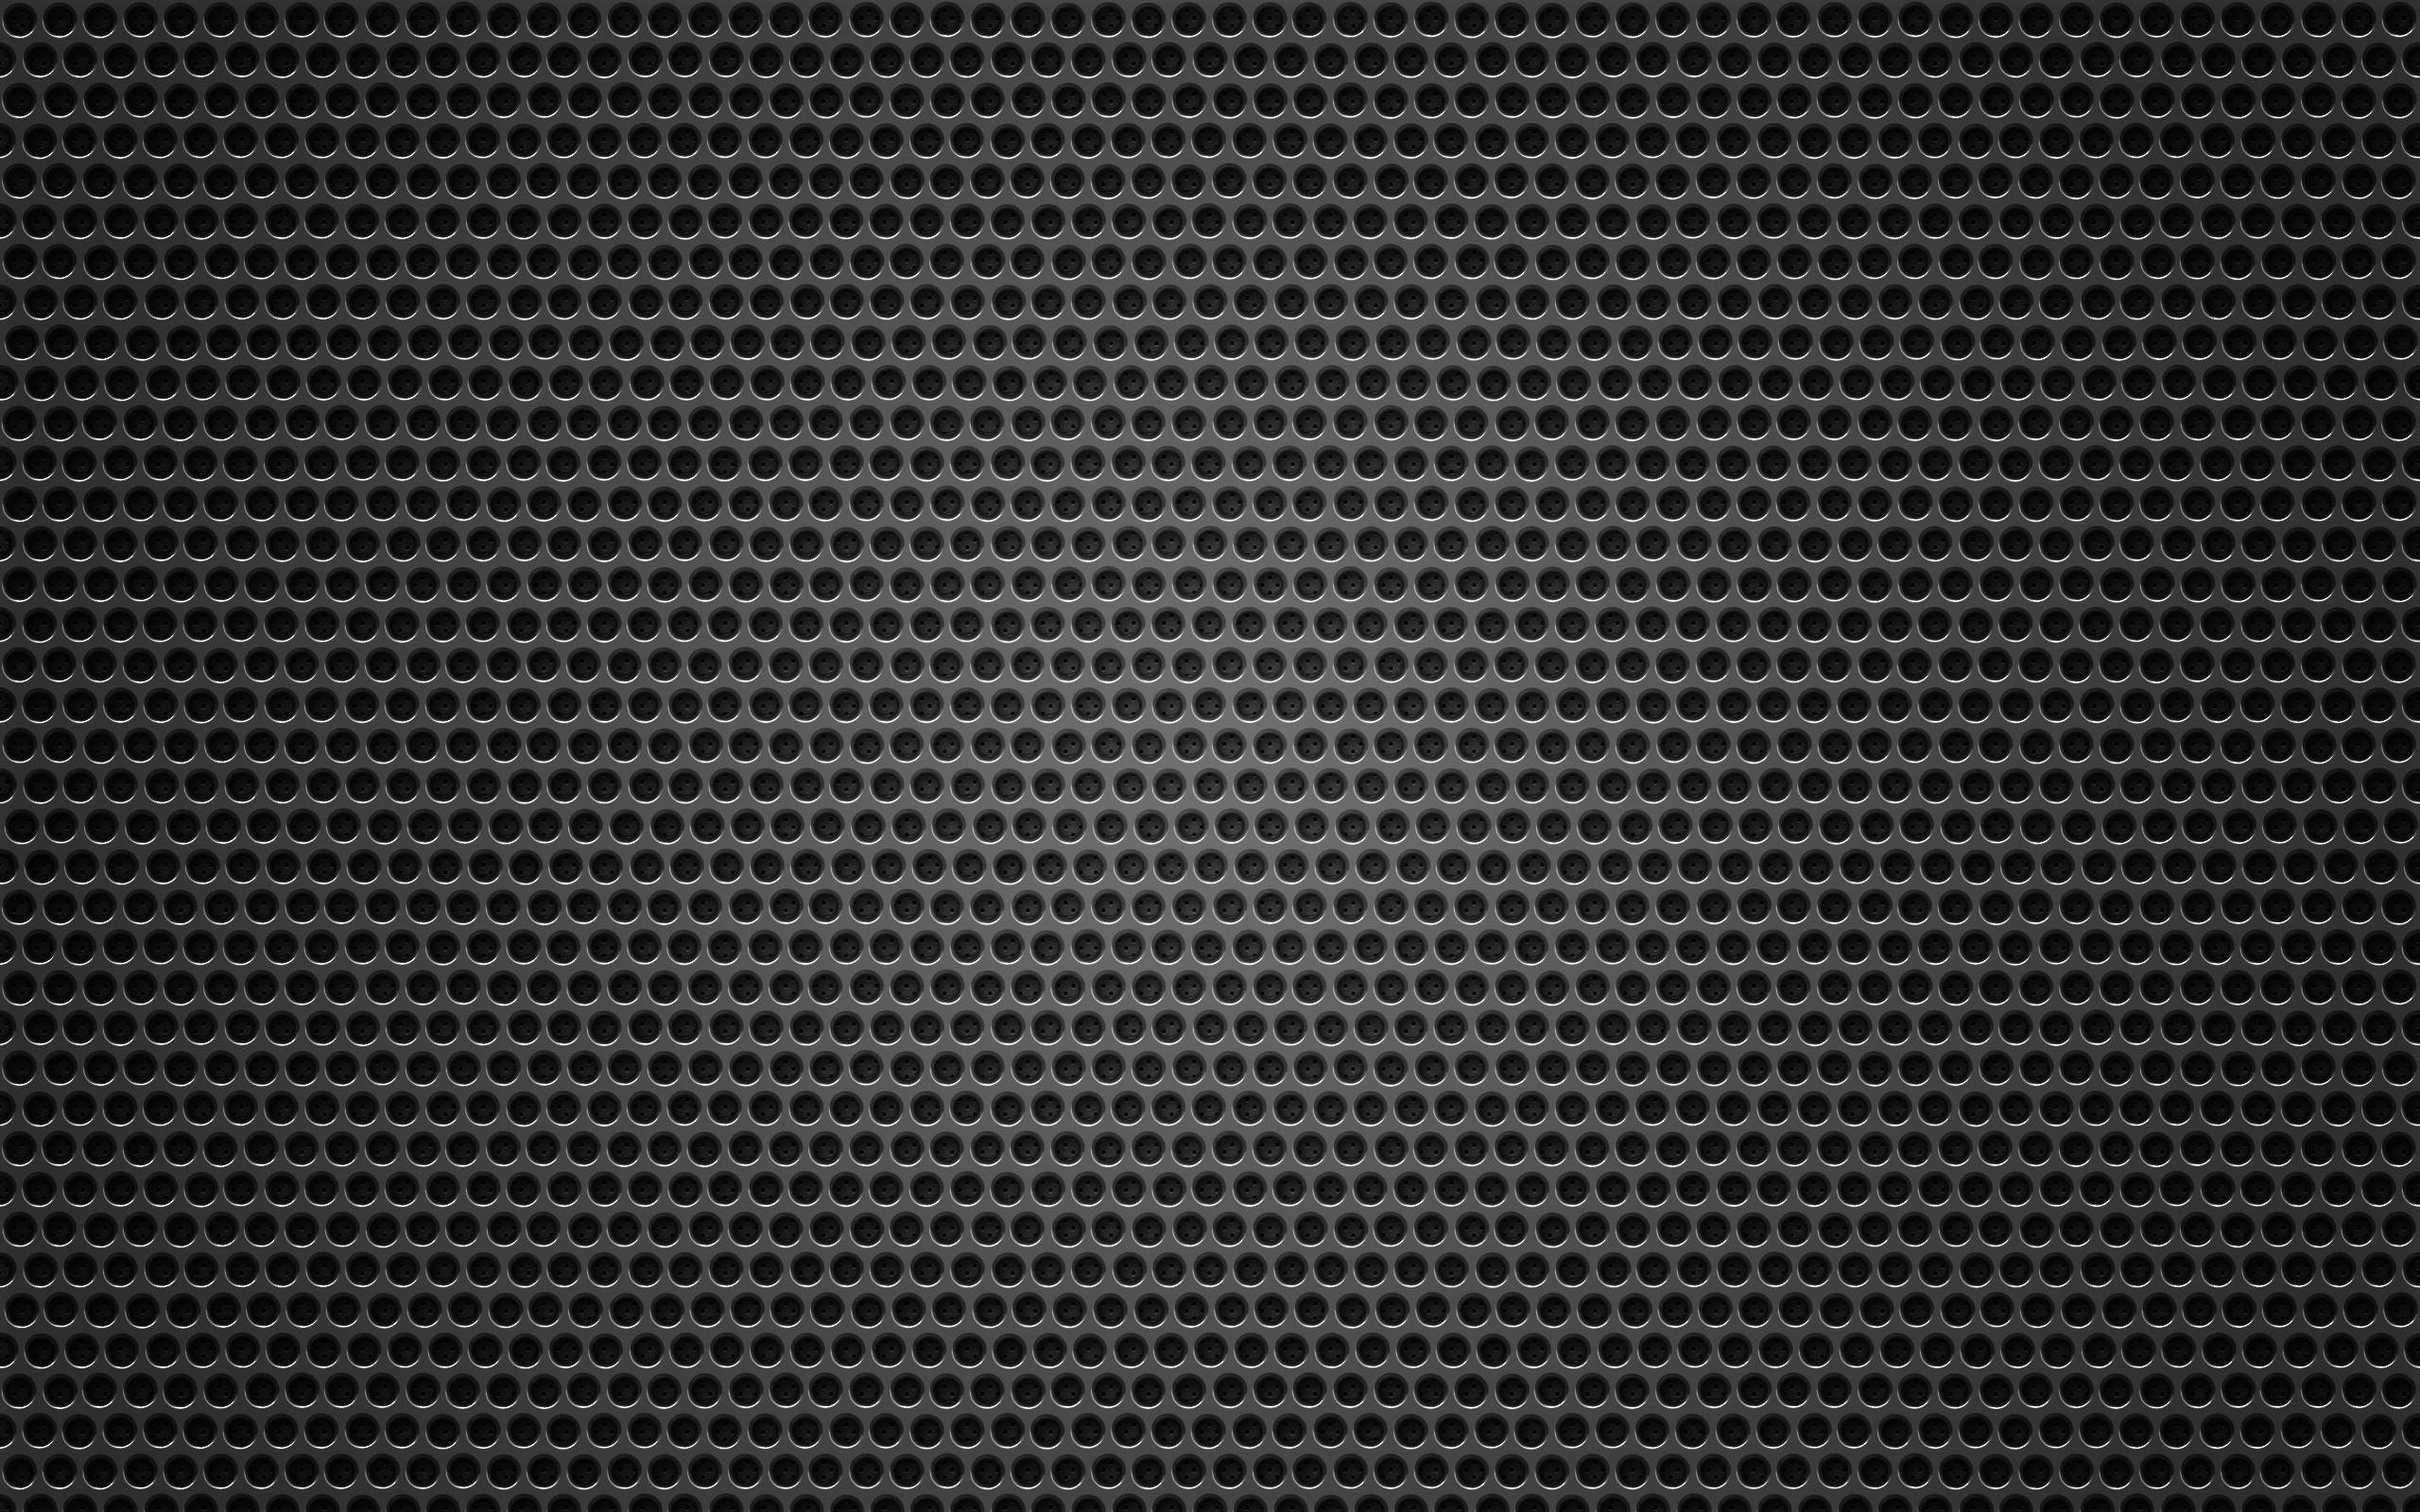 Carbon fiber background download free hd wallpapers for 2560x1600 full size carbon fiber background 2560x1600 for android 40 voltagebd Images